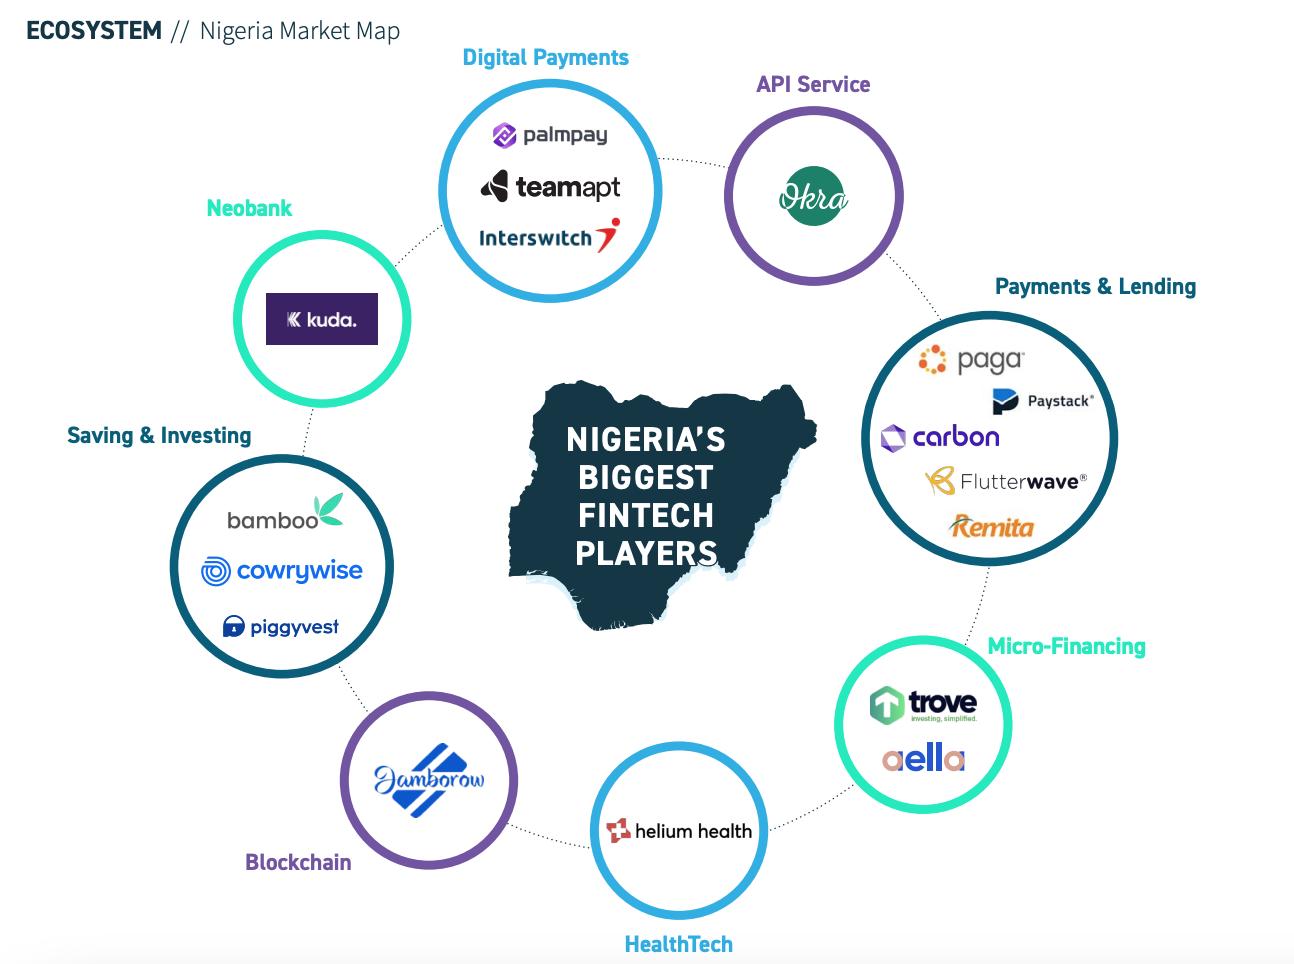 Niggerias-biggest-fintech-players-Africa-Fintech-State-of-the-Industry-2020-Africa-Fintech-Summit-Oct-2020